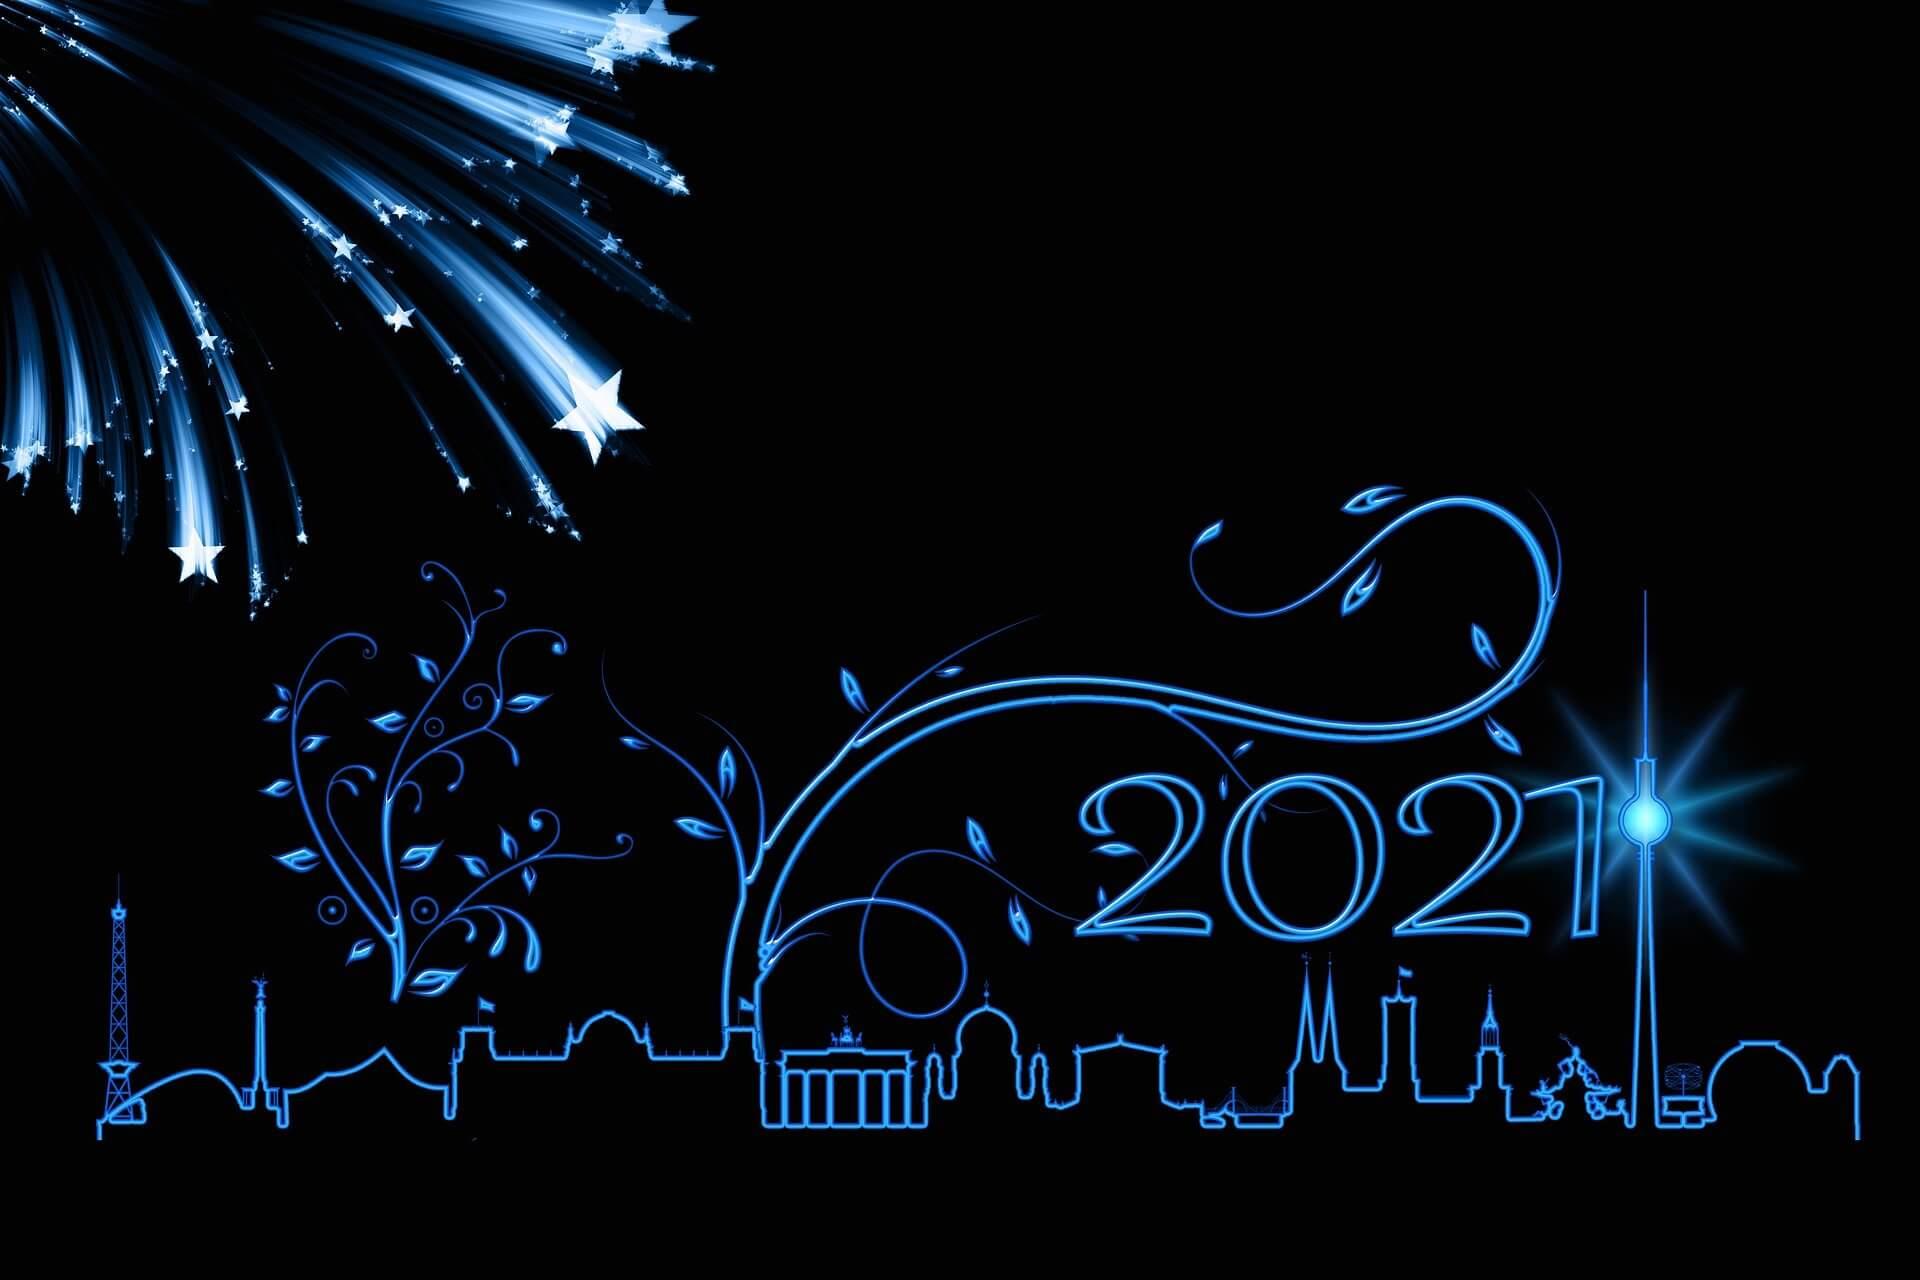 Happy New Year 2021 HD Pic